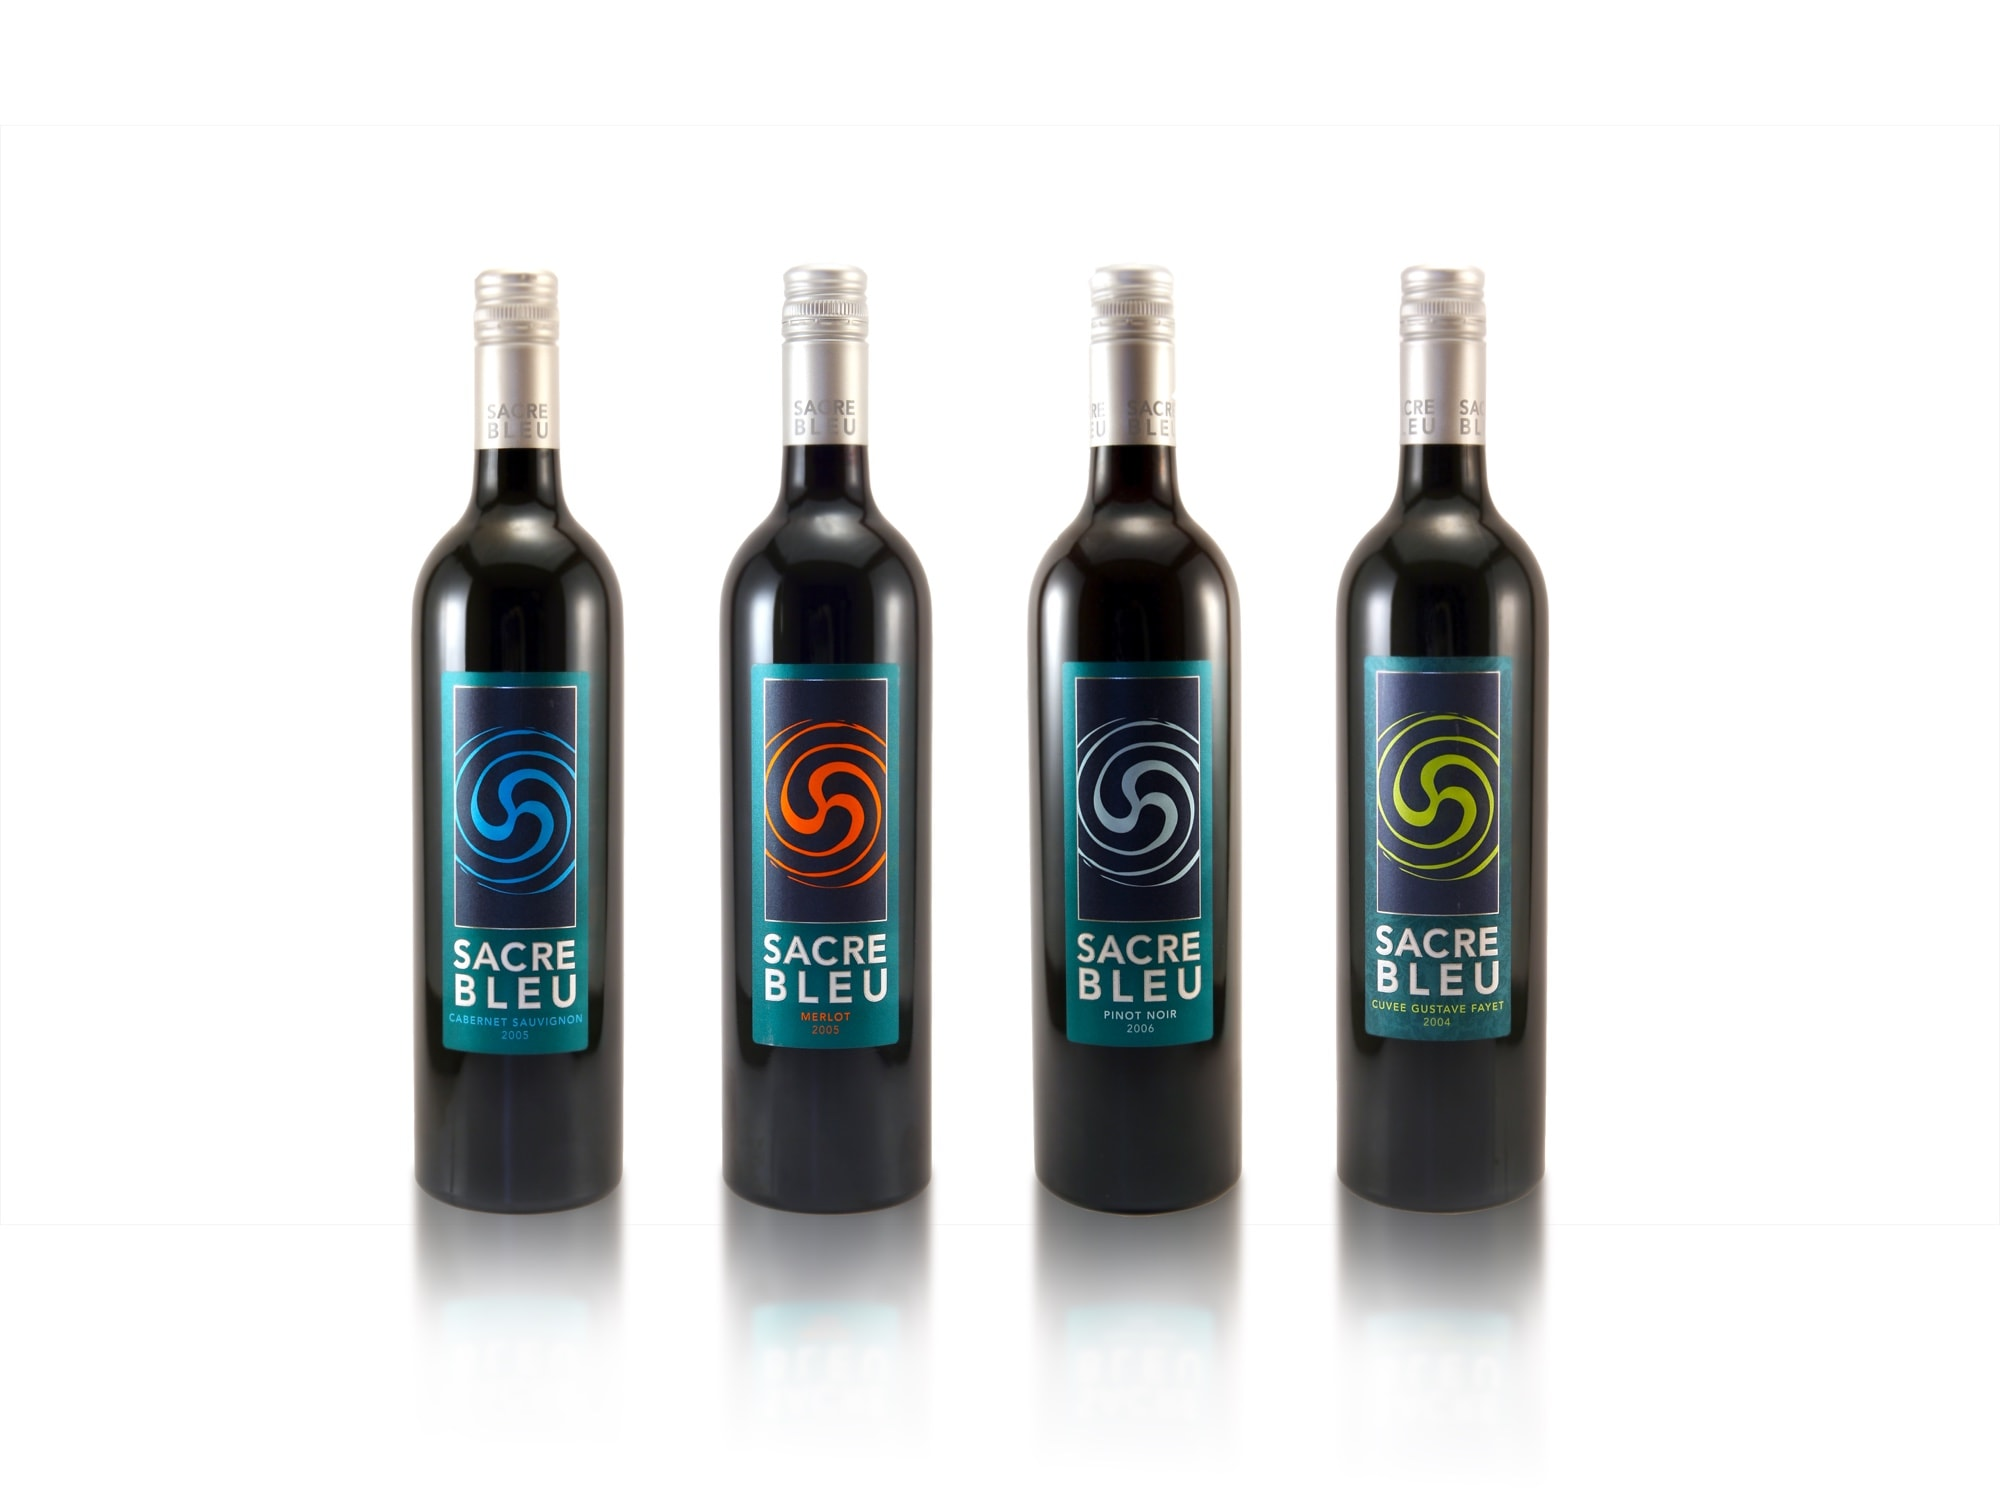 Sacre Bleu Wine 2000×1500